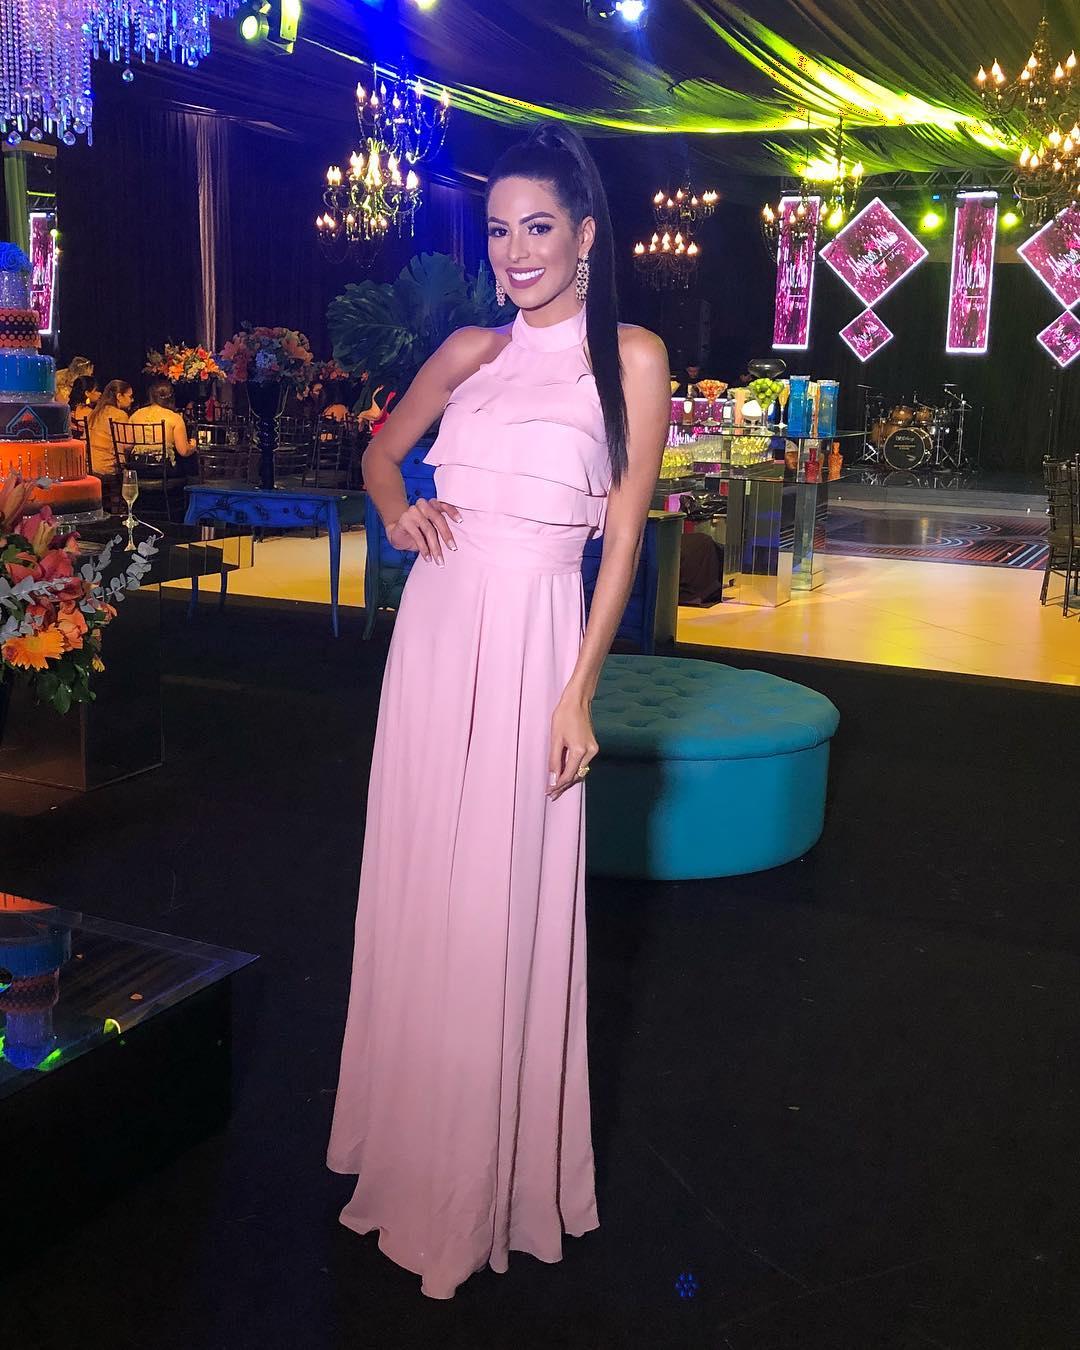 mayra dias, top 20 de miss universe 2018/primeira finalista de rainha hispanoamericana 2016. - Página 5 30078910